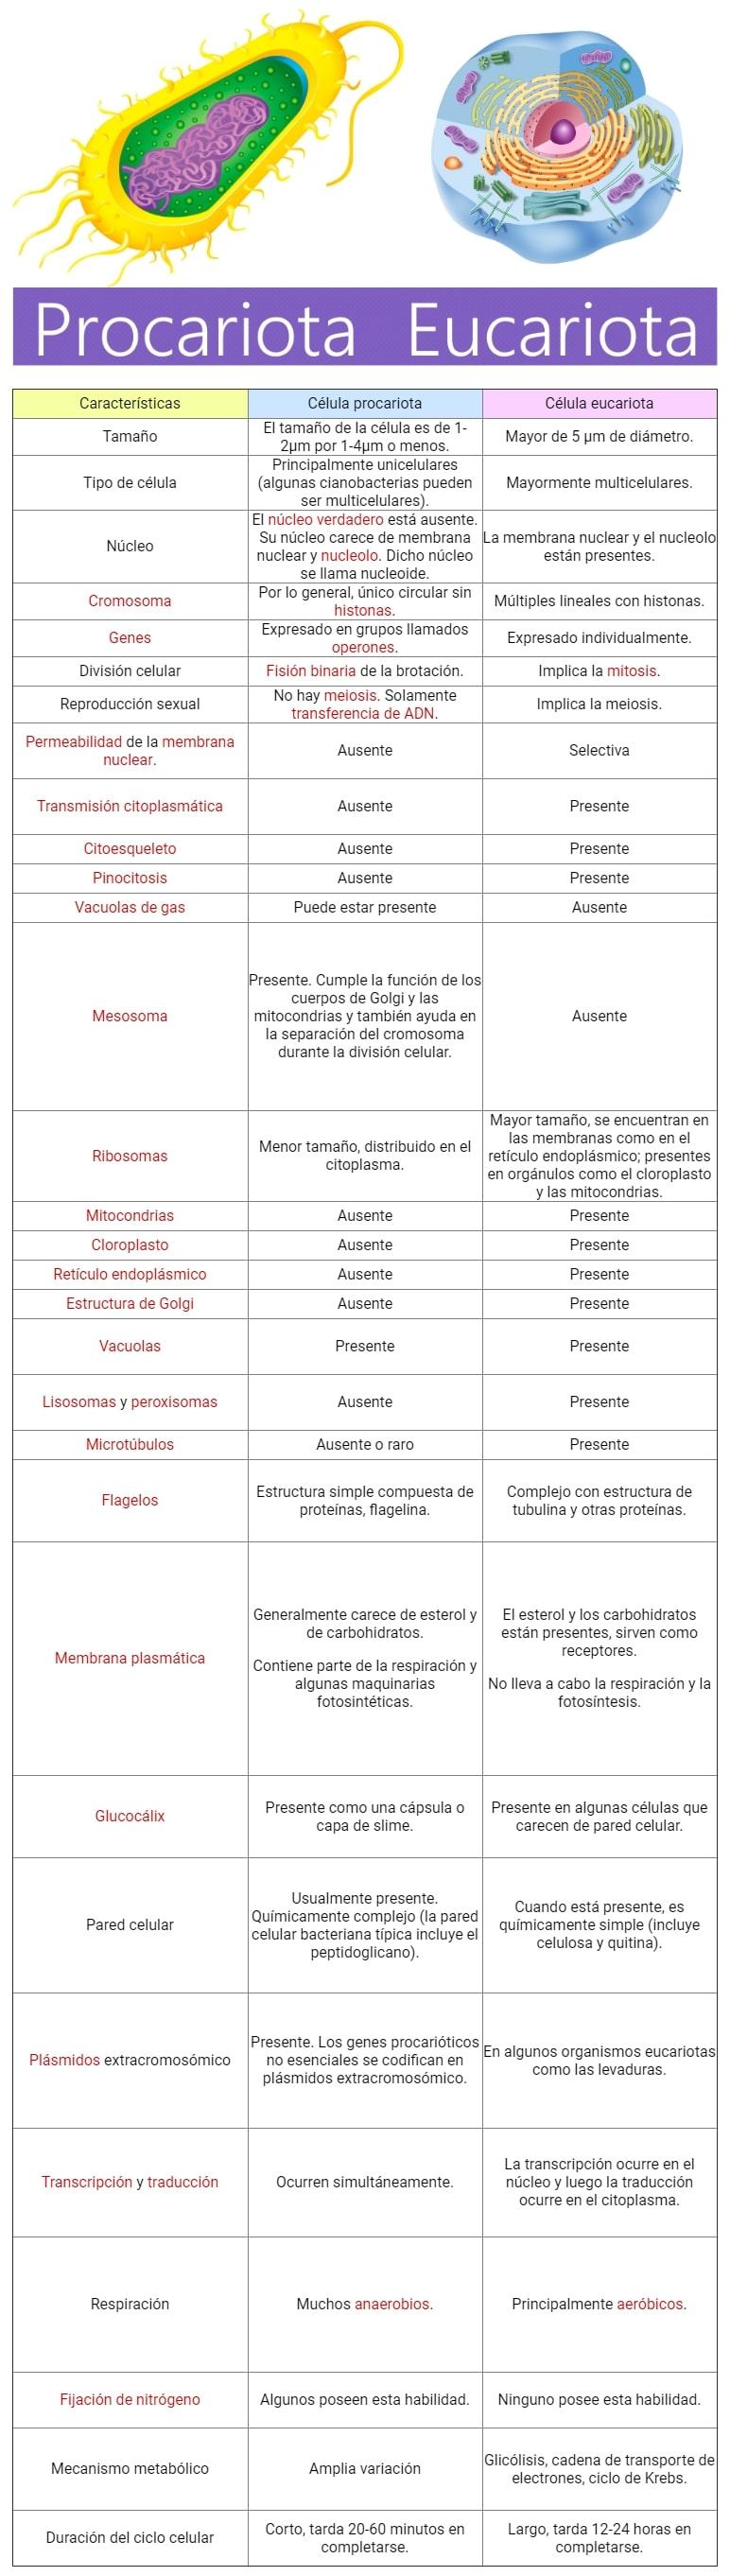 Diferencia Entre Célula Eucariota Y Procariota Cuadro